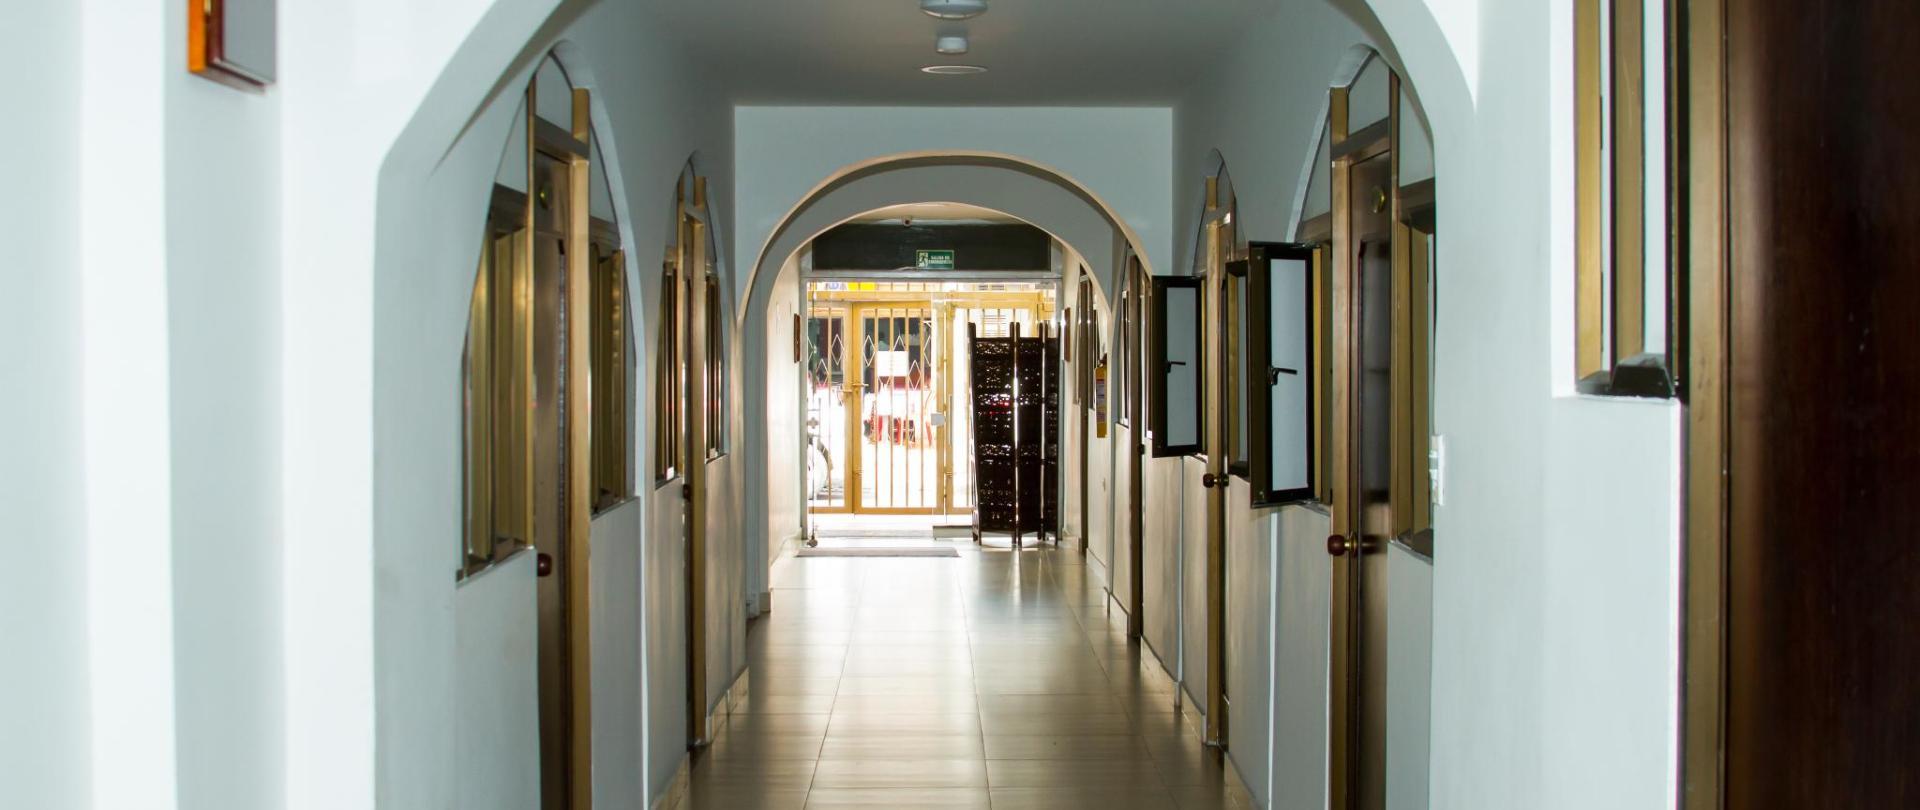 Hotel_Siar-8009.jpg